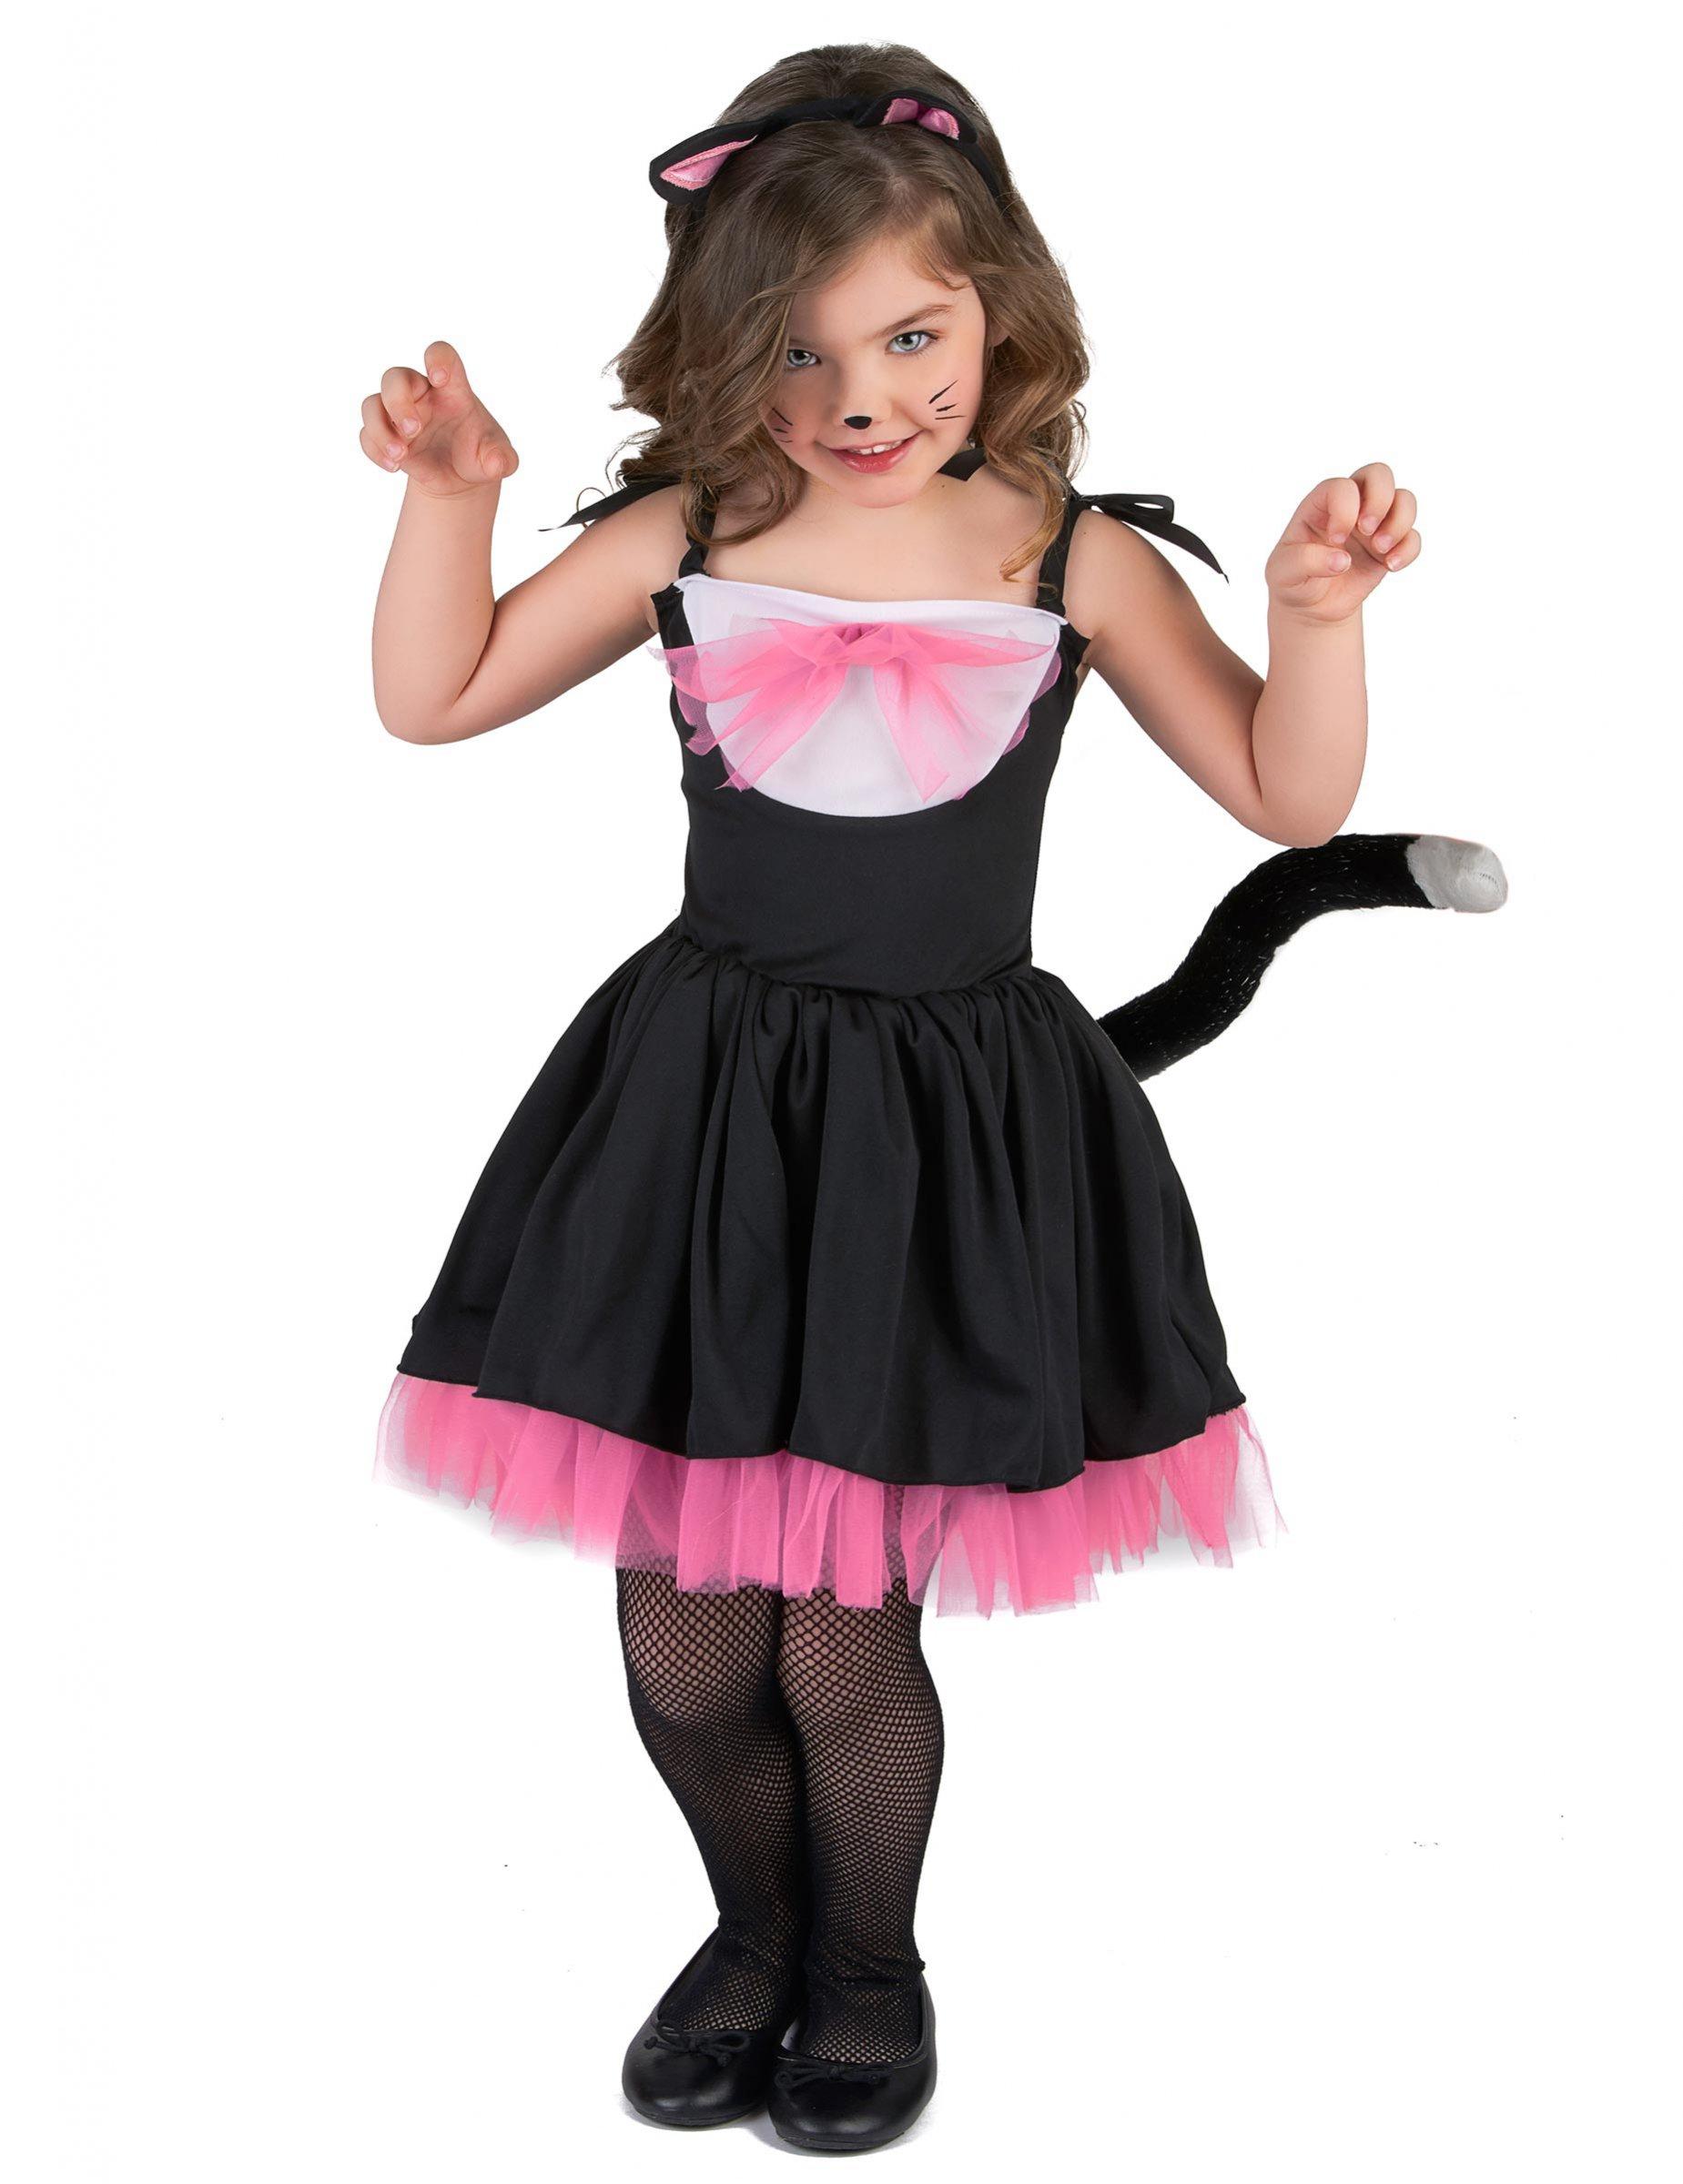 Fantasia de Mulher Gato infantil